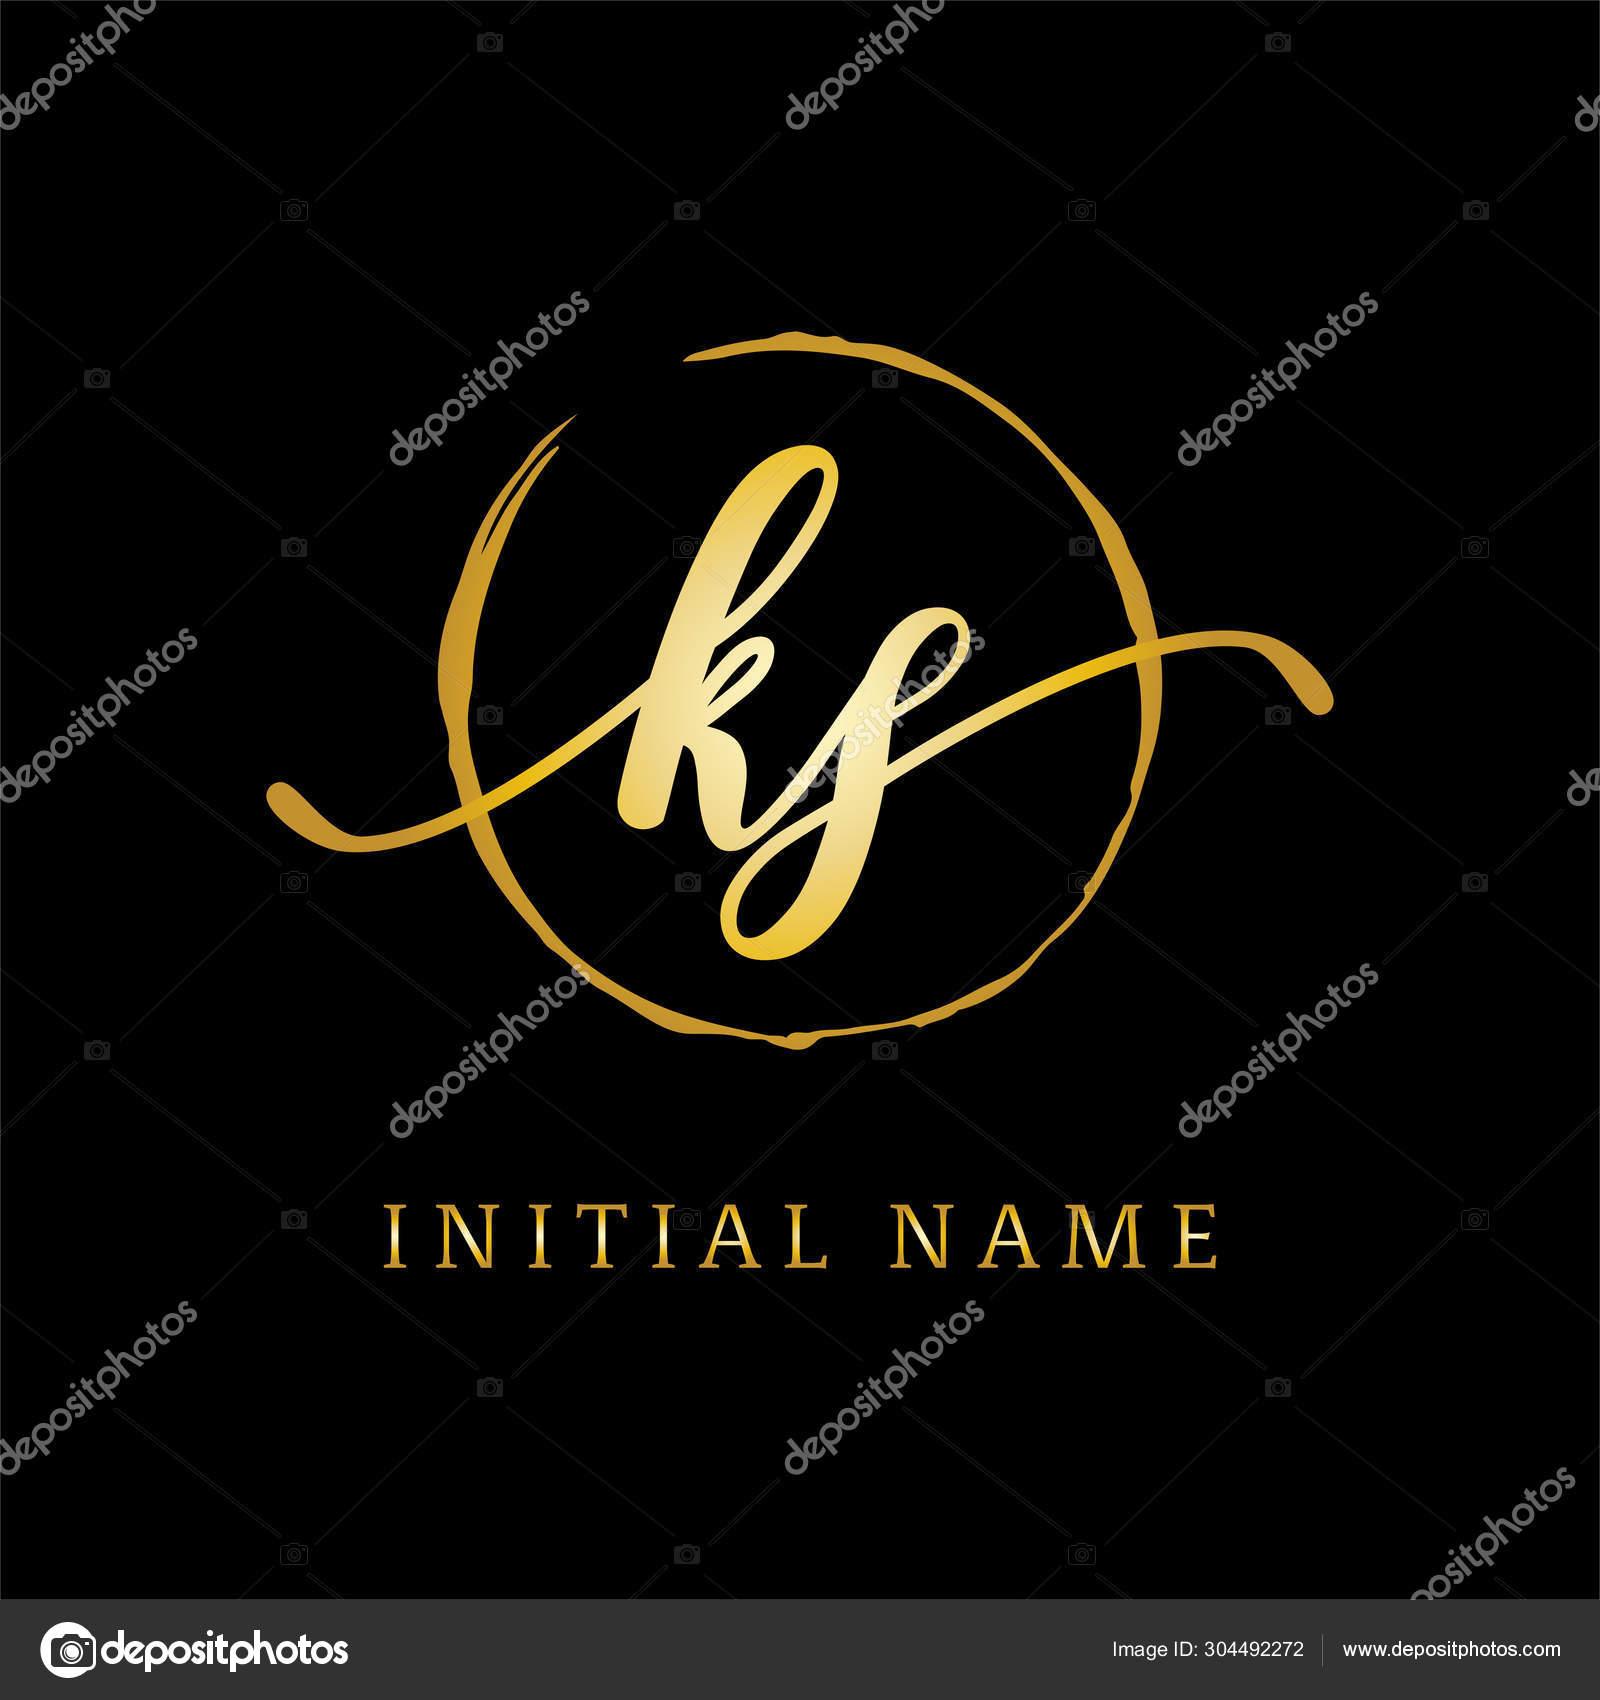 k s beauty logo inspiration luxury logo design stock vector c arjuna alvarendra gmail com 304492272 k s beauty logo inspiration luxury logo design stock vector c arjuna alvarendra gmail com 304492272